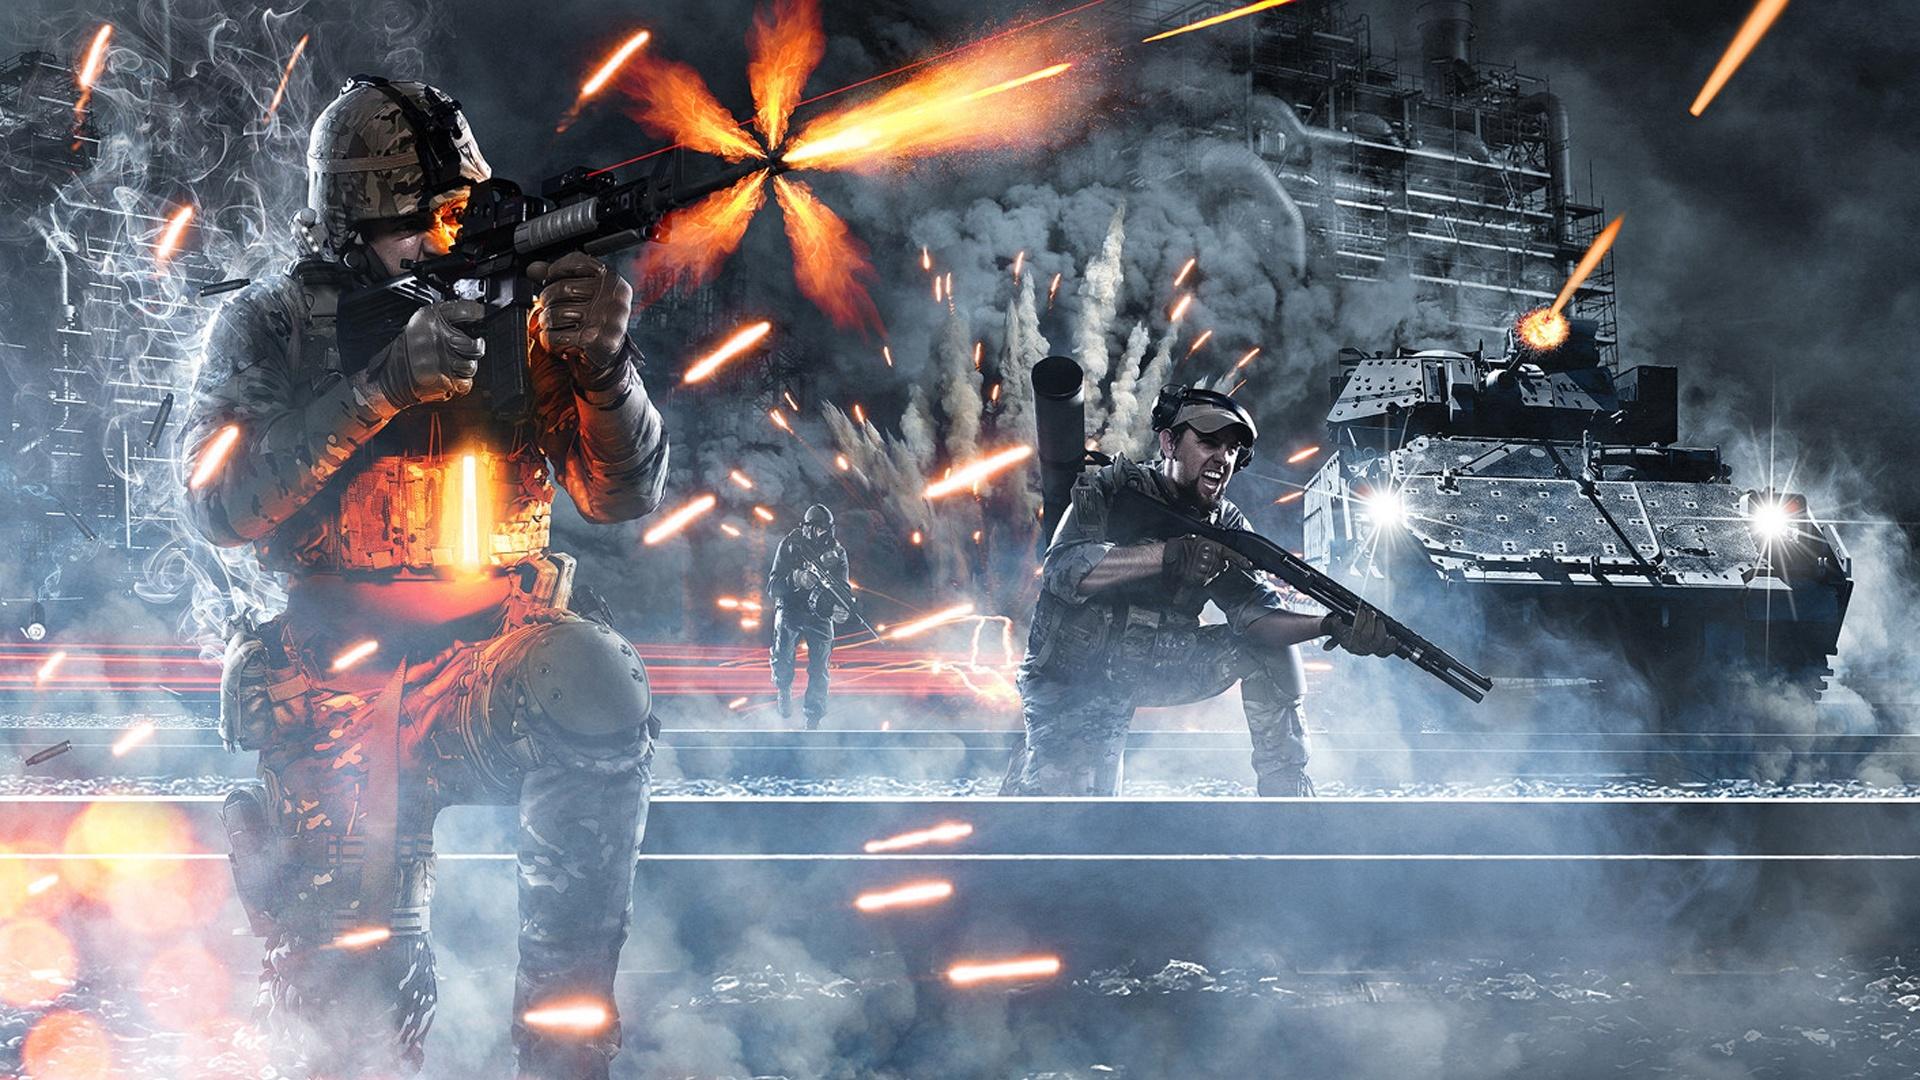 Battlefield 4 game wallpaper full hd desktop wallpapers 1080p - Battlefield 3 hd wallpaper 1080p ...